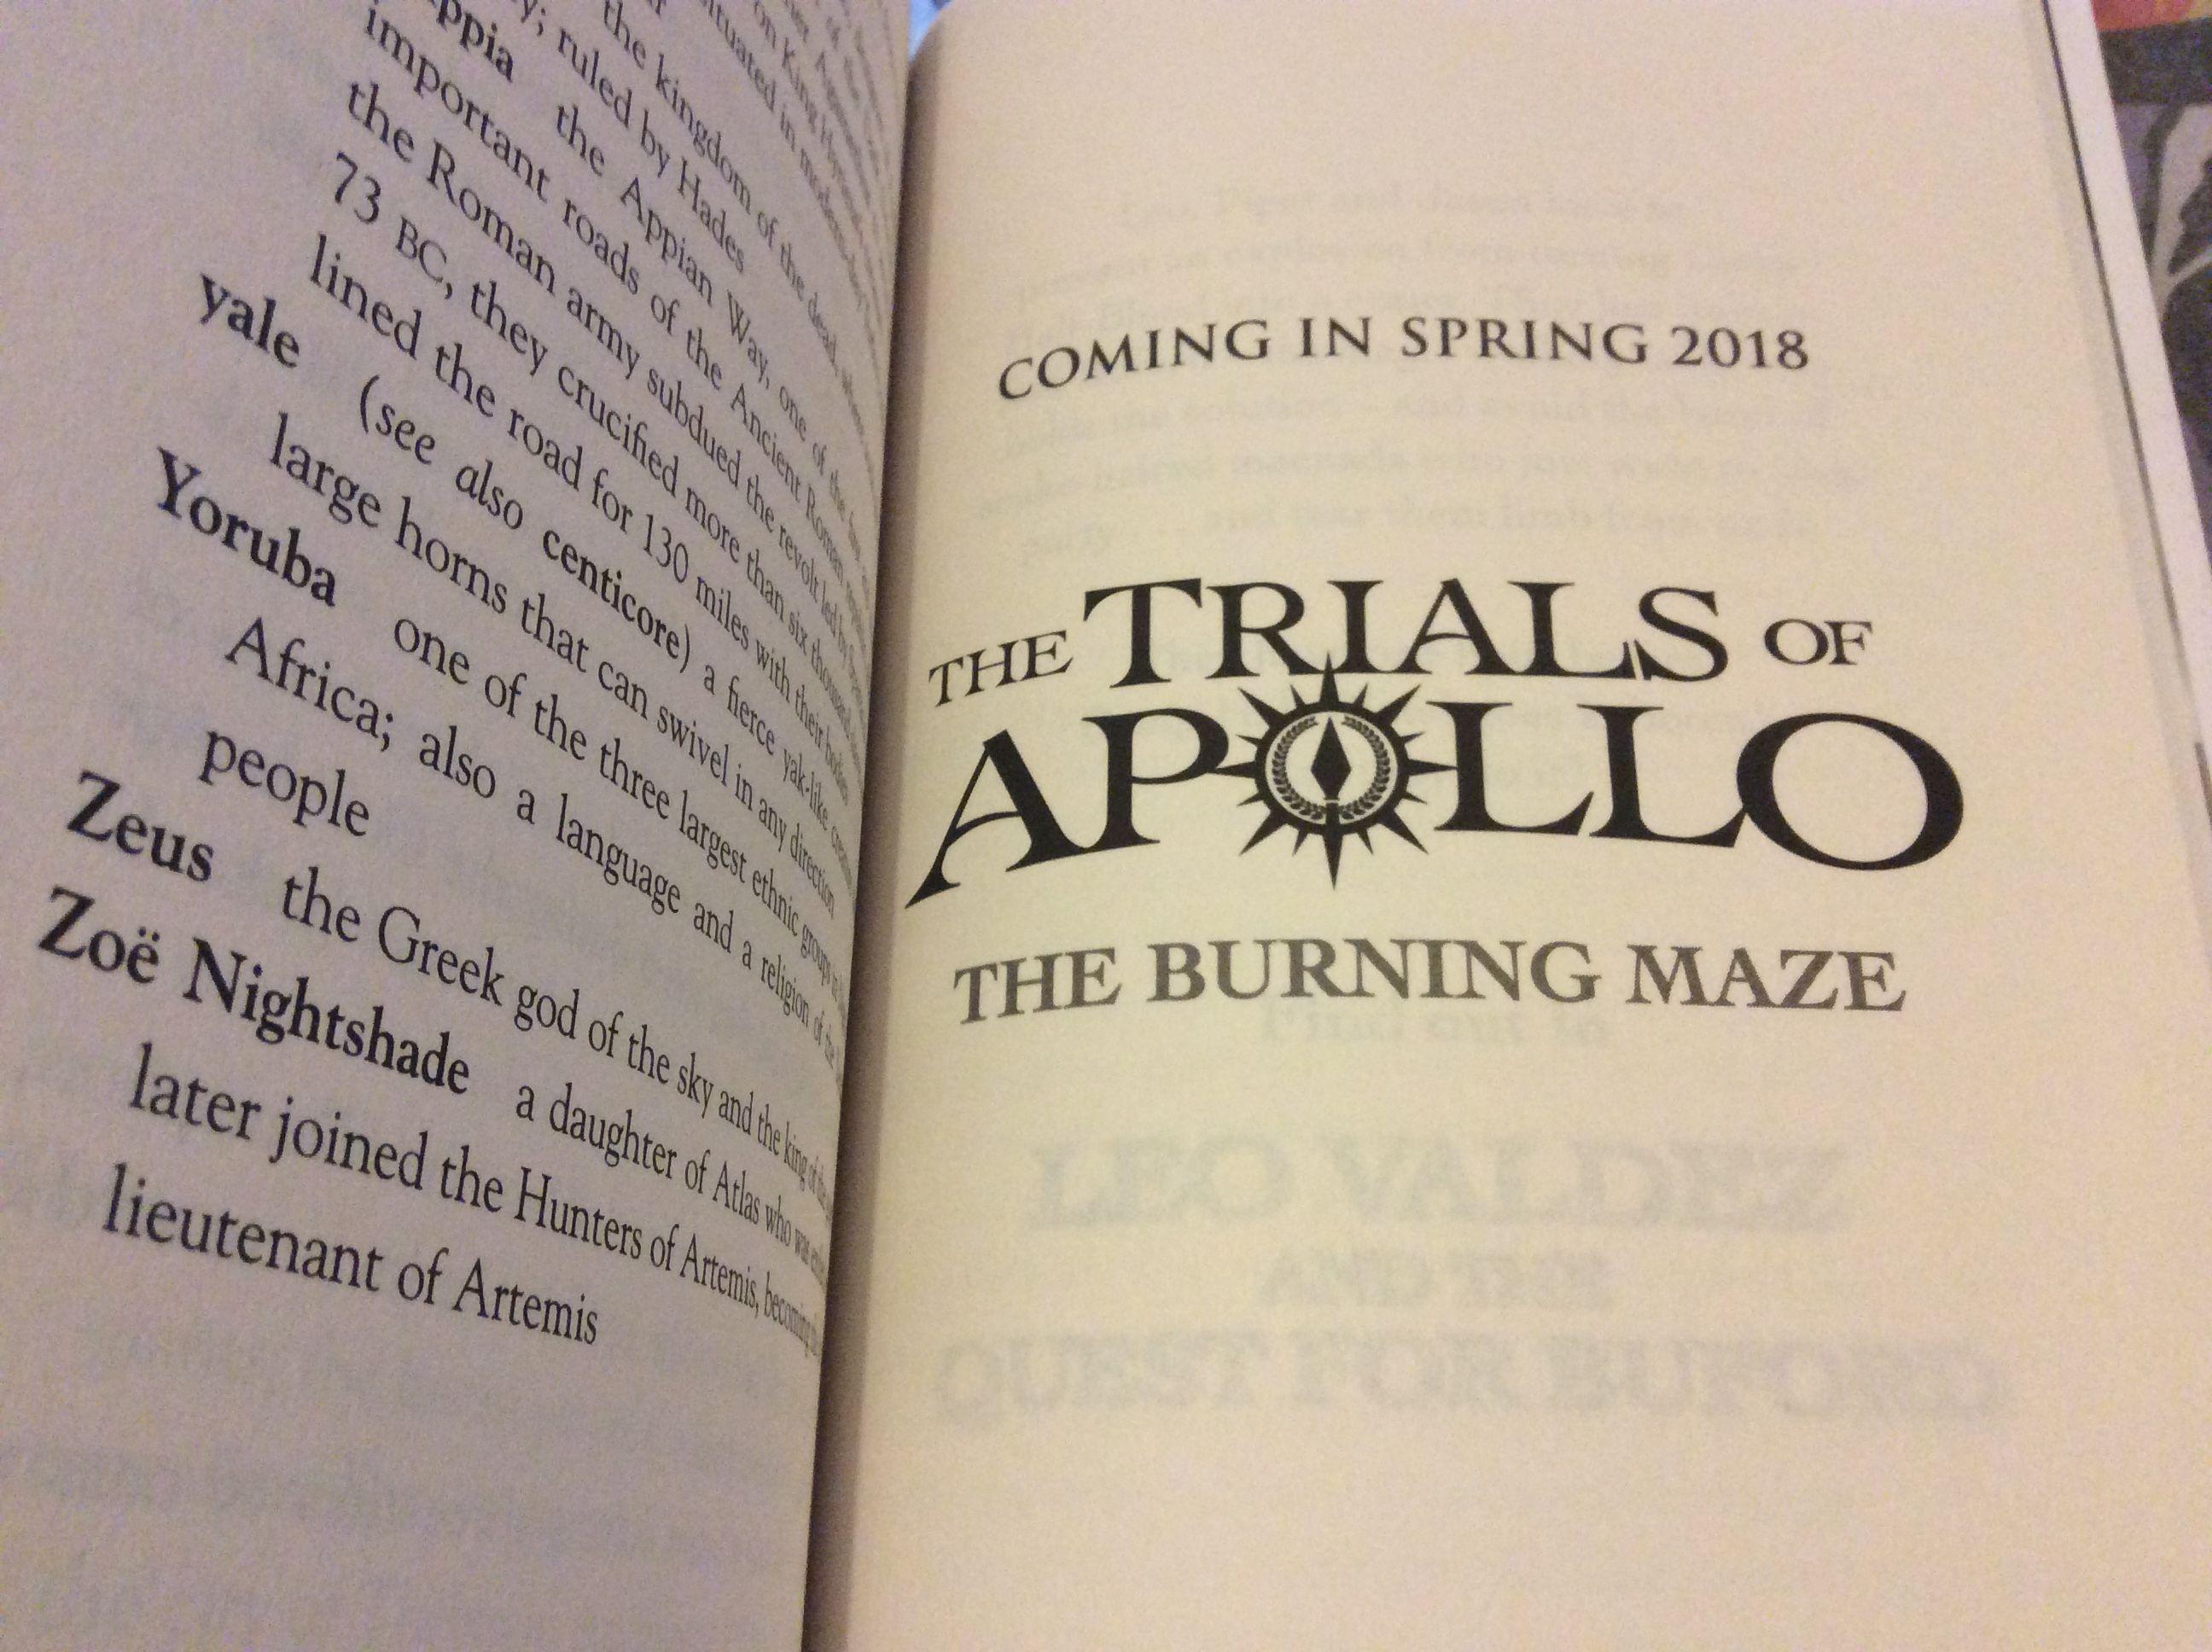 The Trials Of Apollo Book 3: The Burning Maze Teaser By Rick Riordan